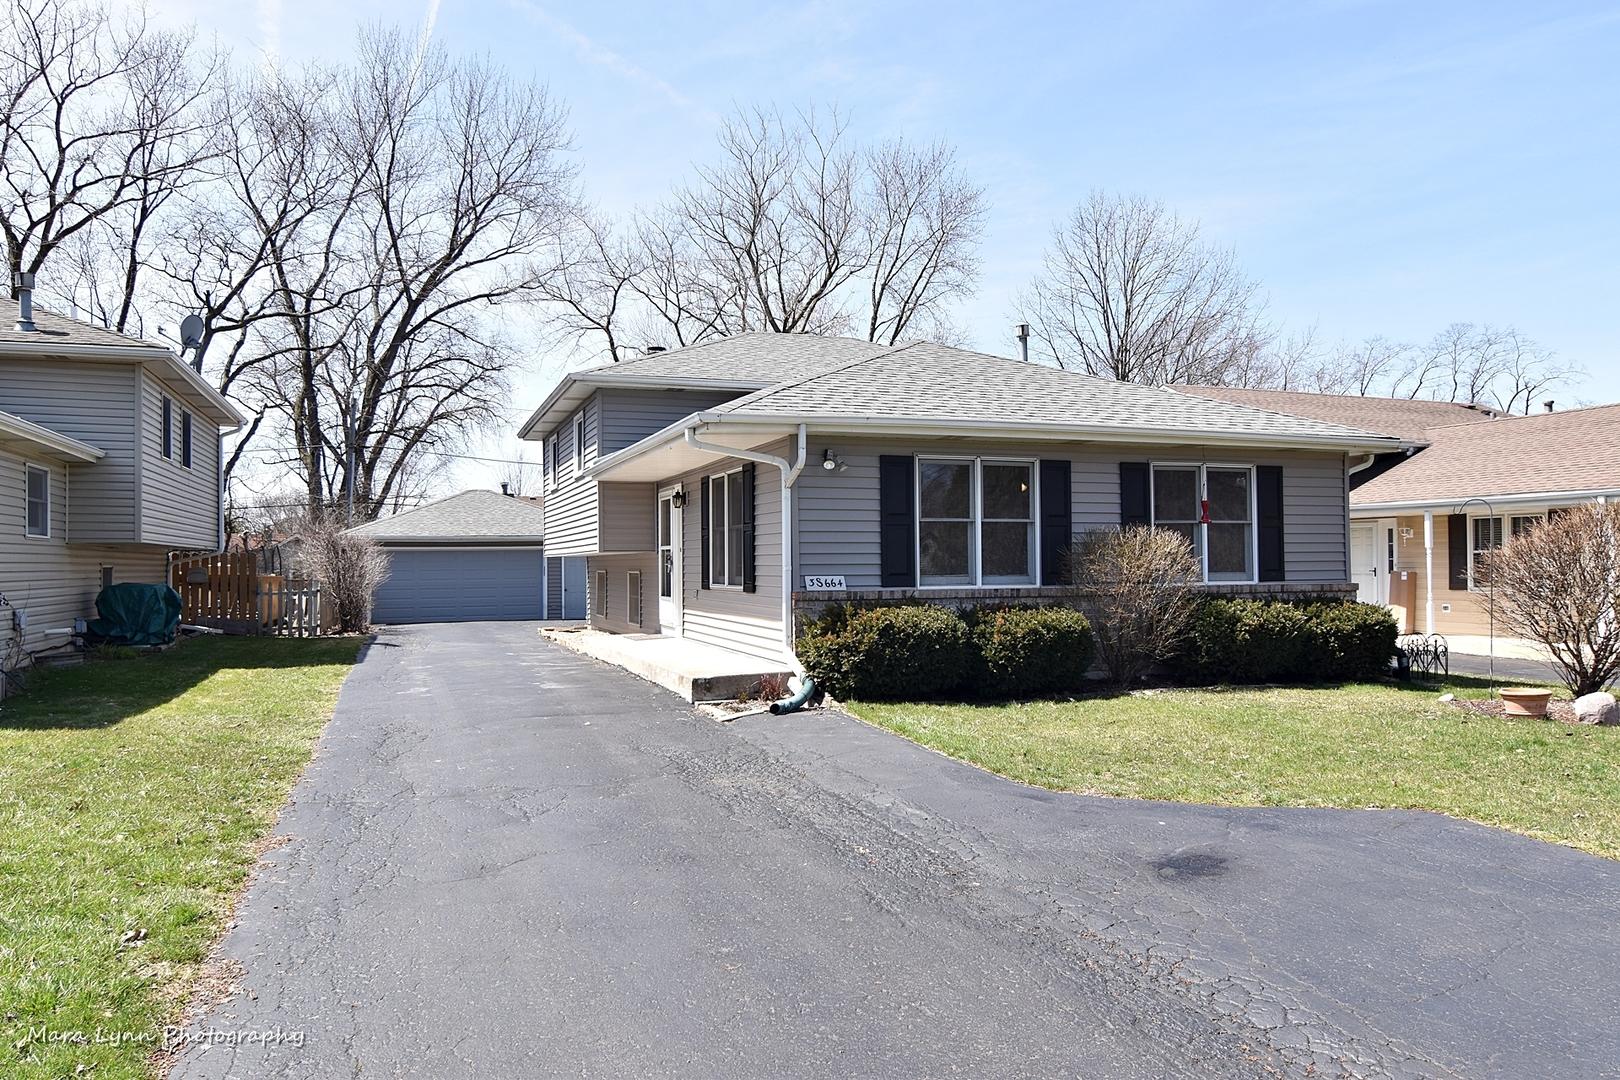 3s664 Melcher Avenue, Warrenville, Illinois 60555